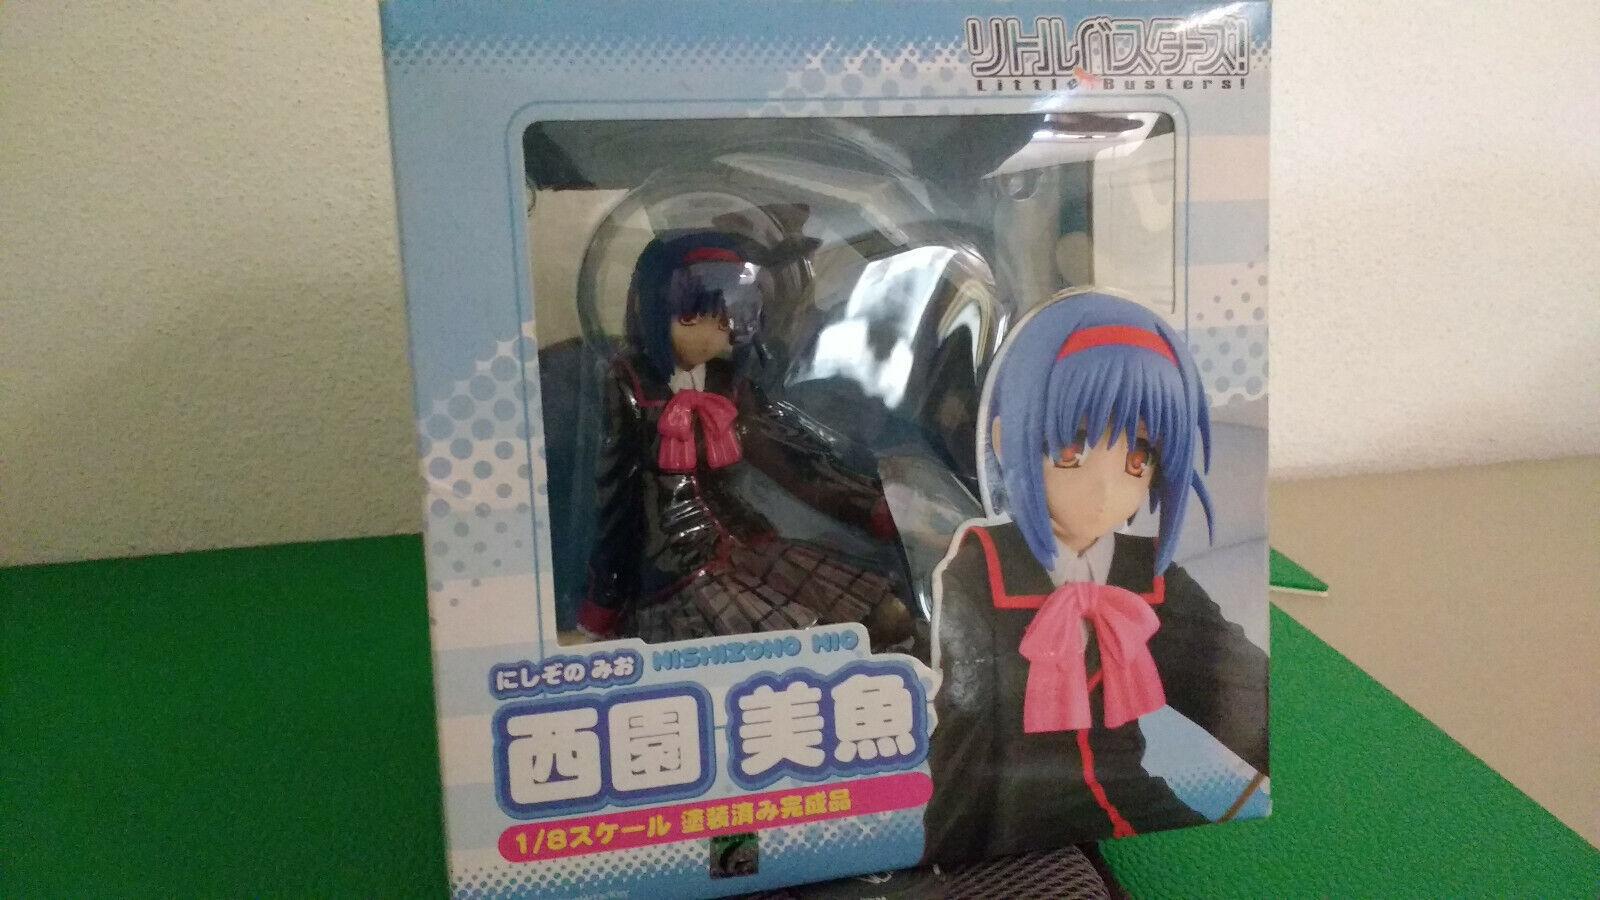 1 8 Chara-Ani Nishizono Mio  Little autoautobusters PVC cifra + extra  comprare a buon mercato